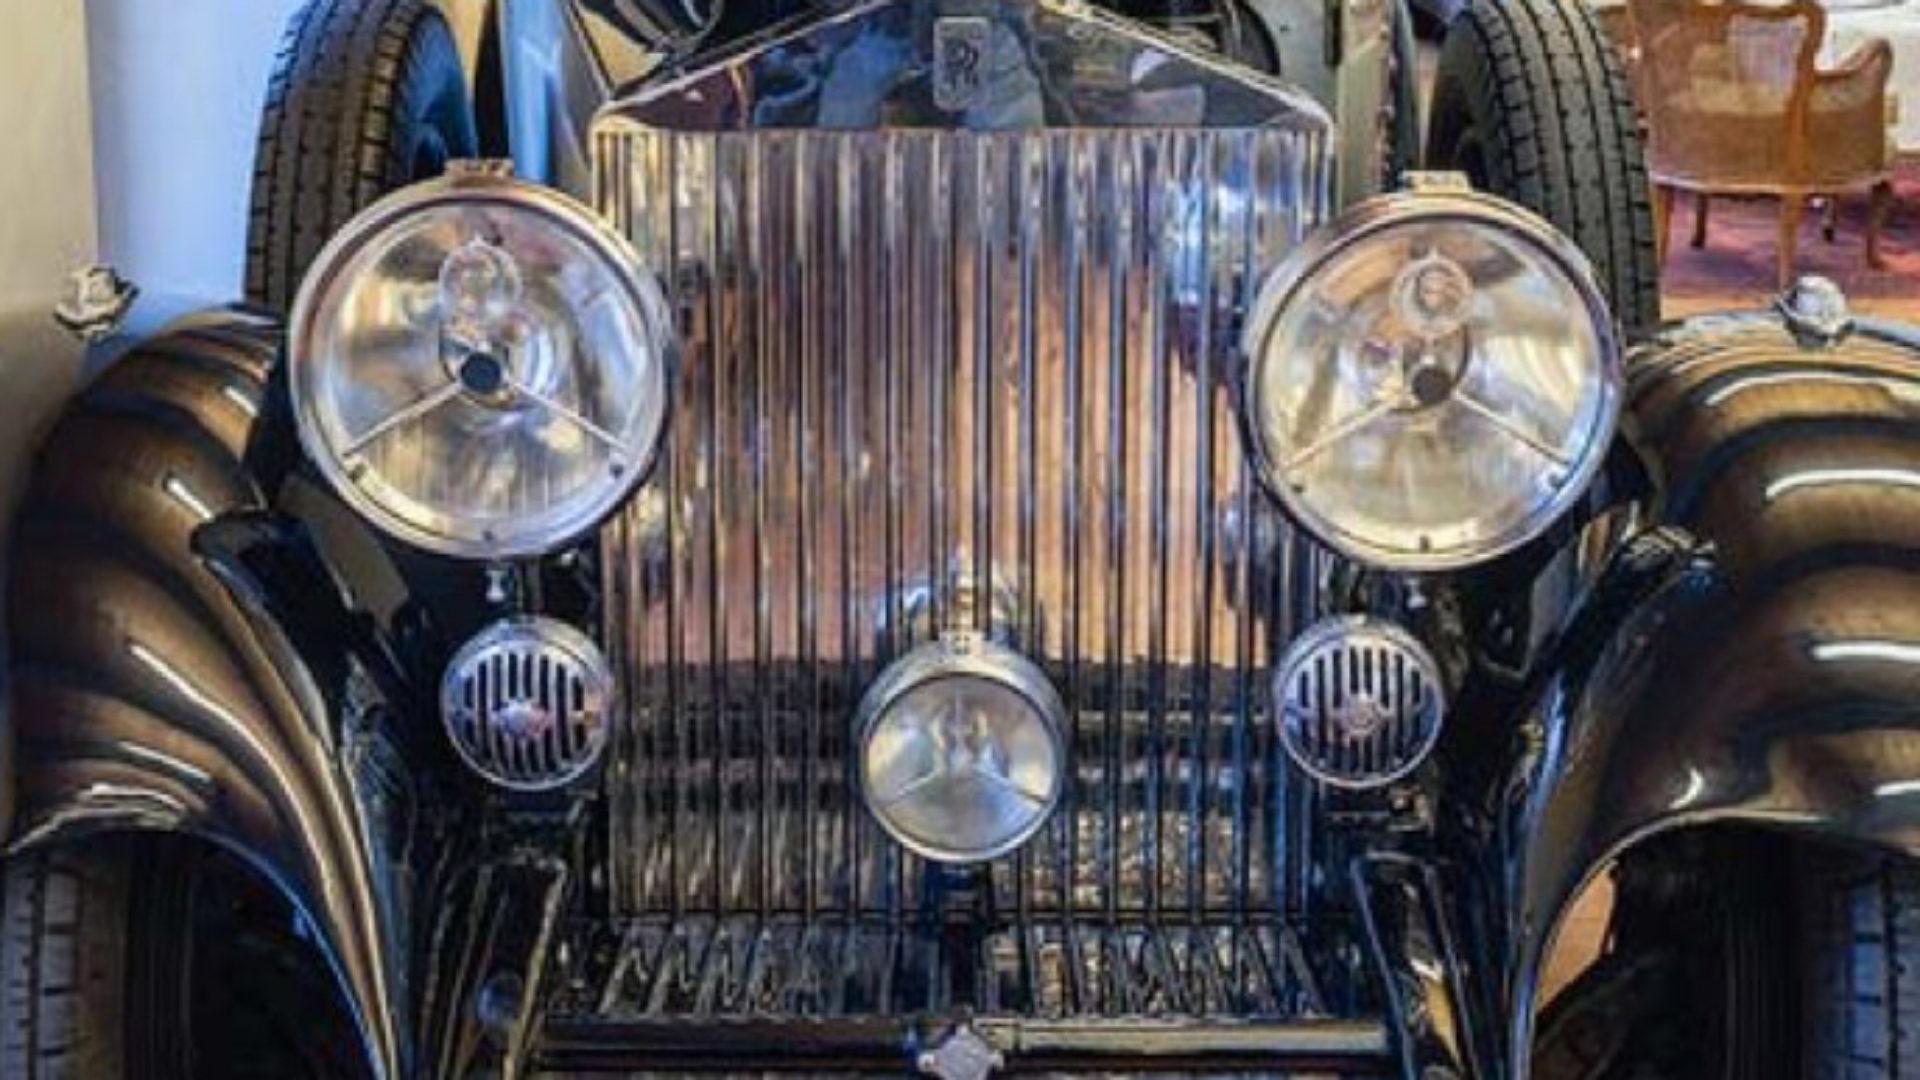 Rolls-Royce Museum, Dornbirn